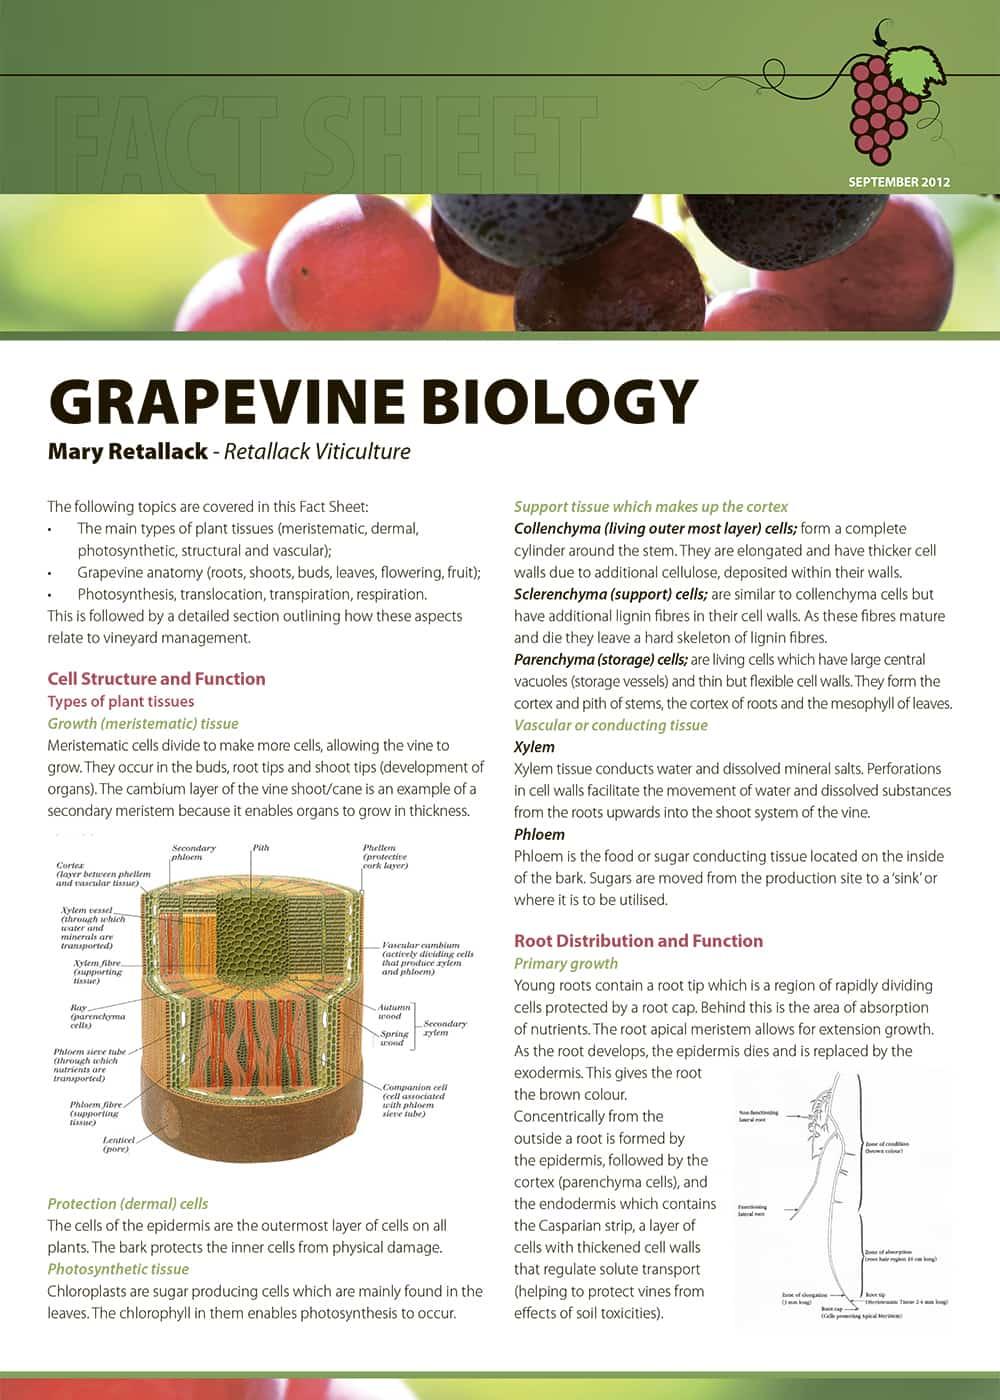 Grapevine Biology